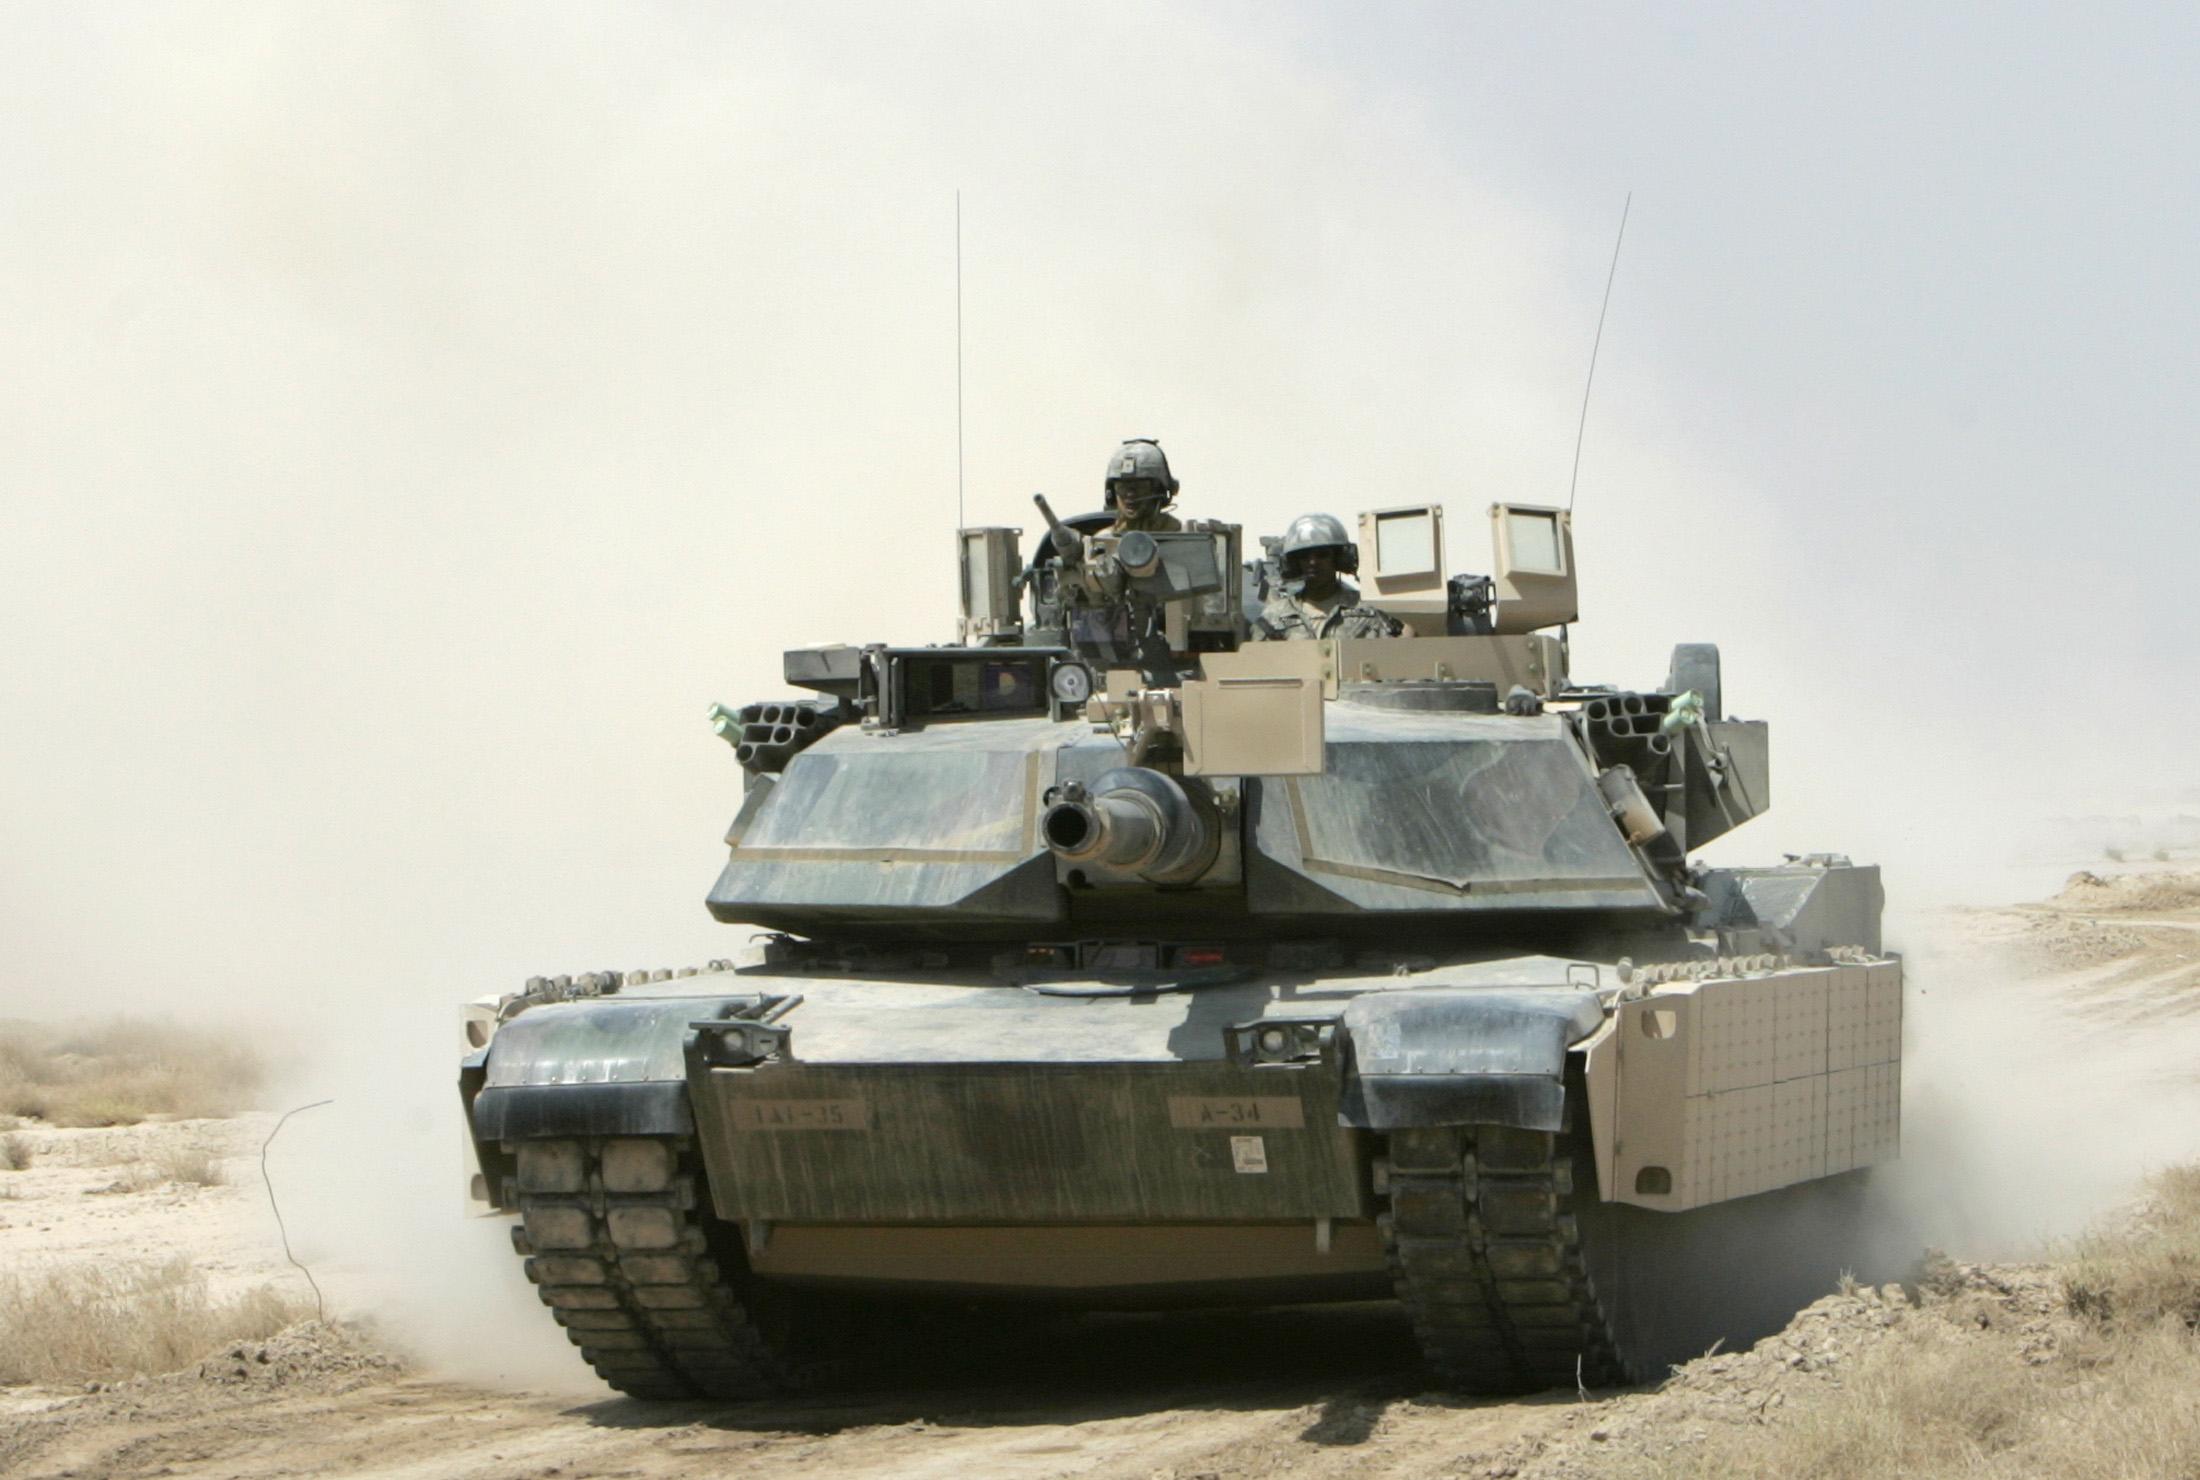 The Abrahams A1 tank - $400 million